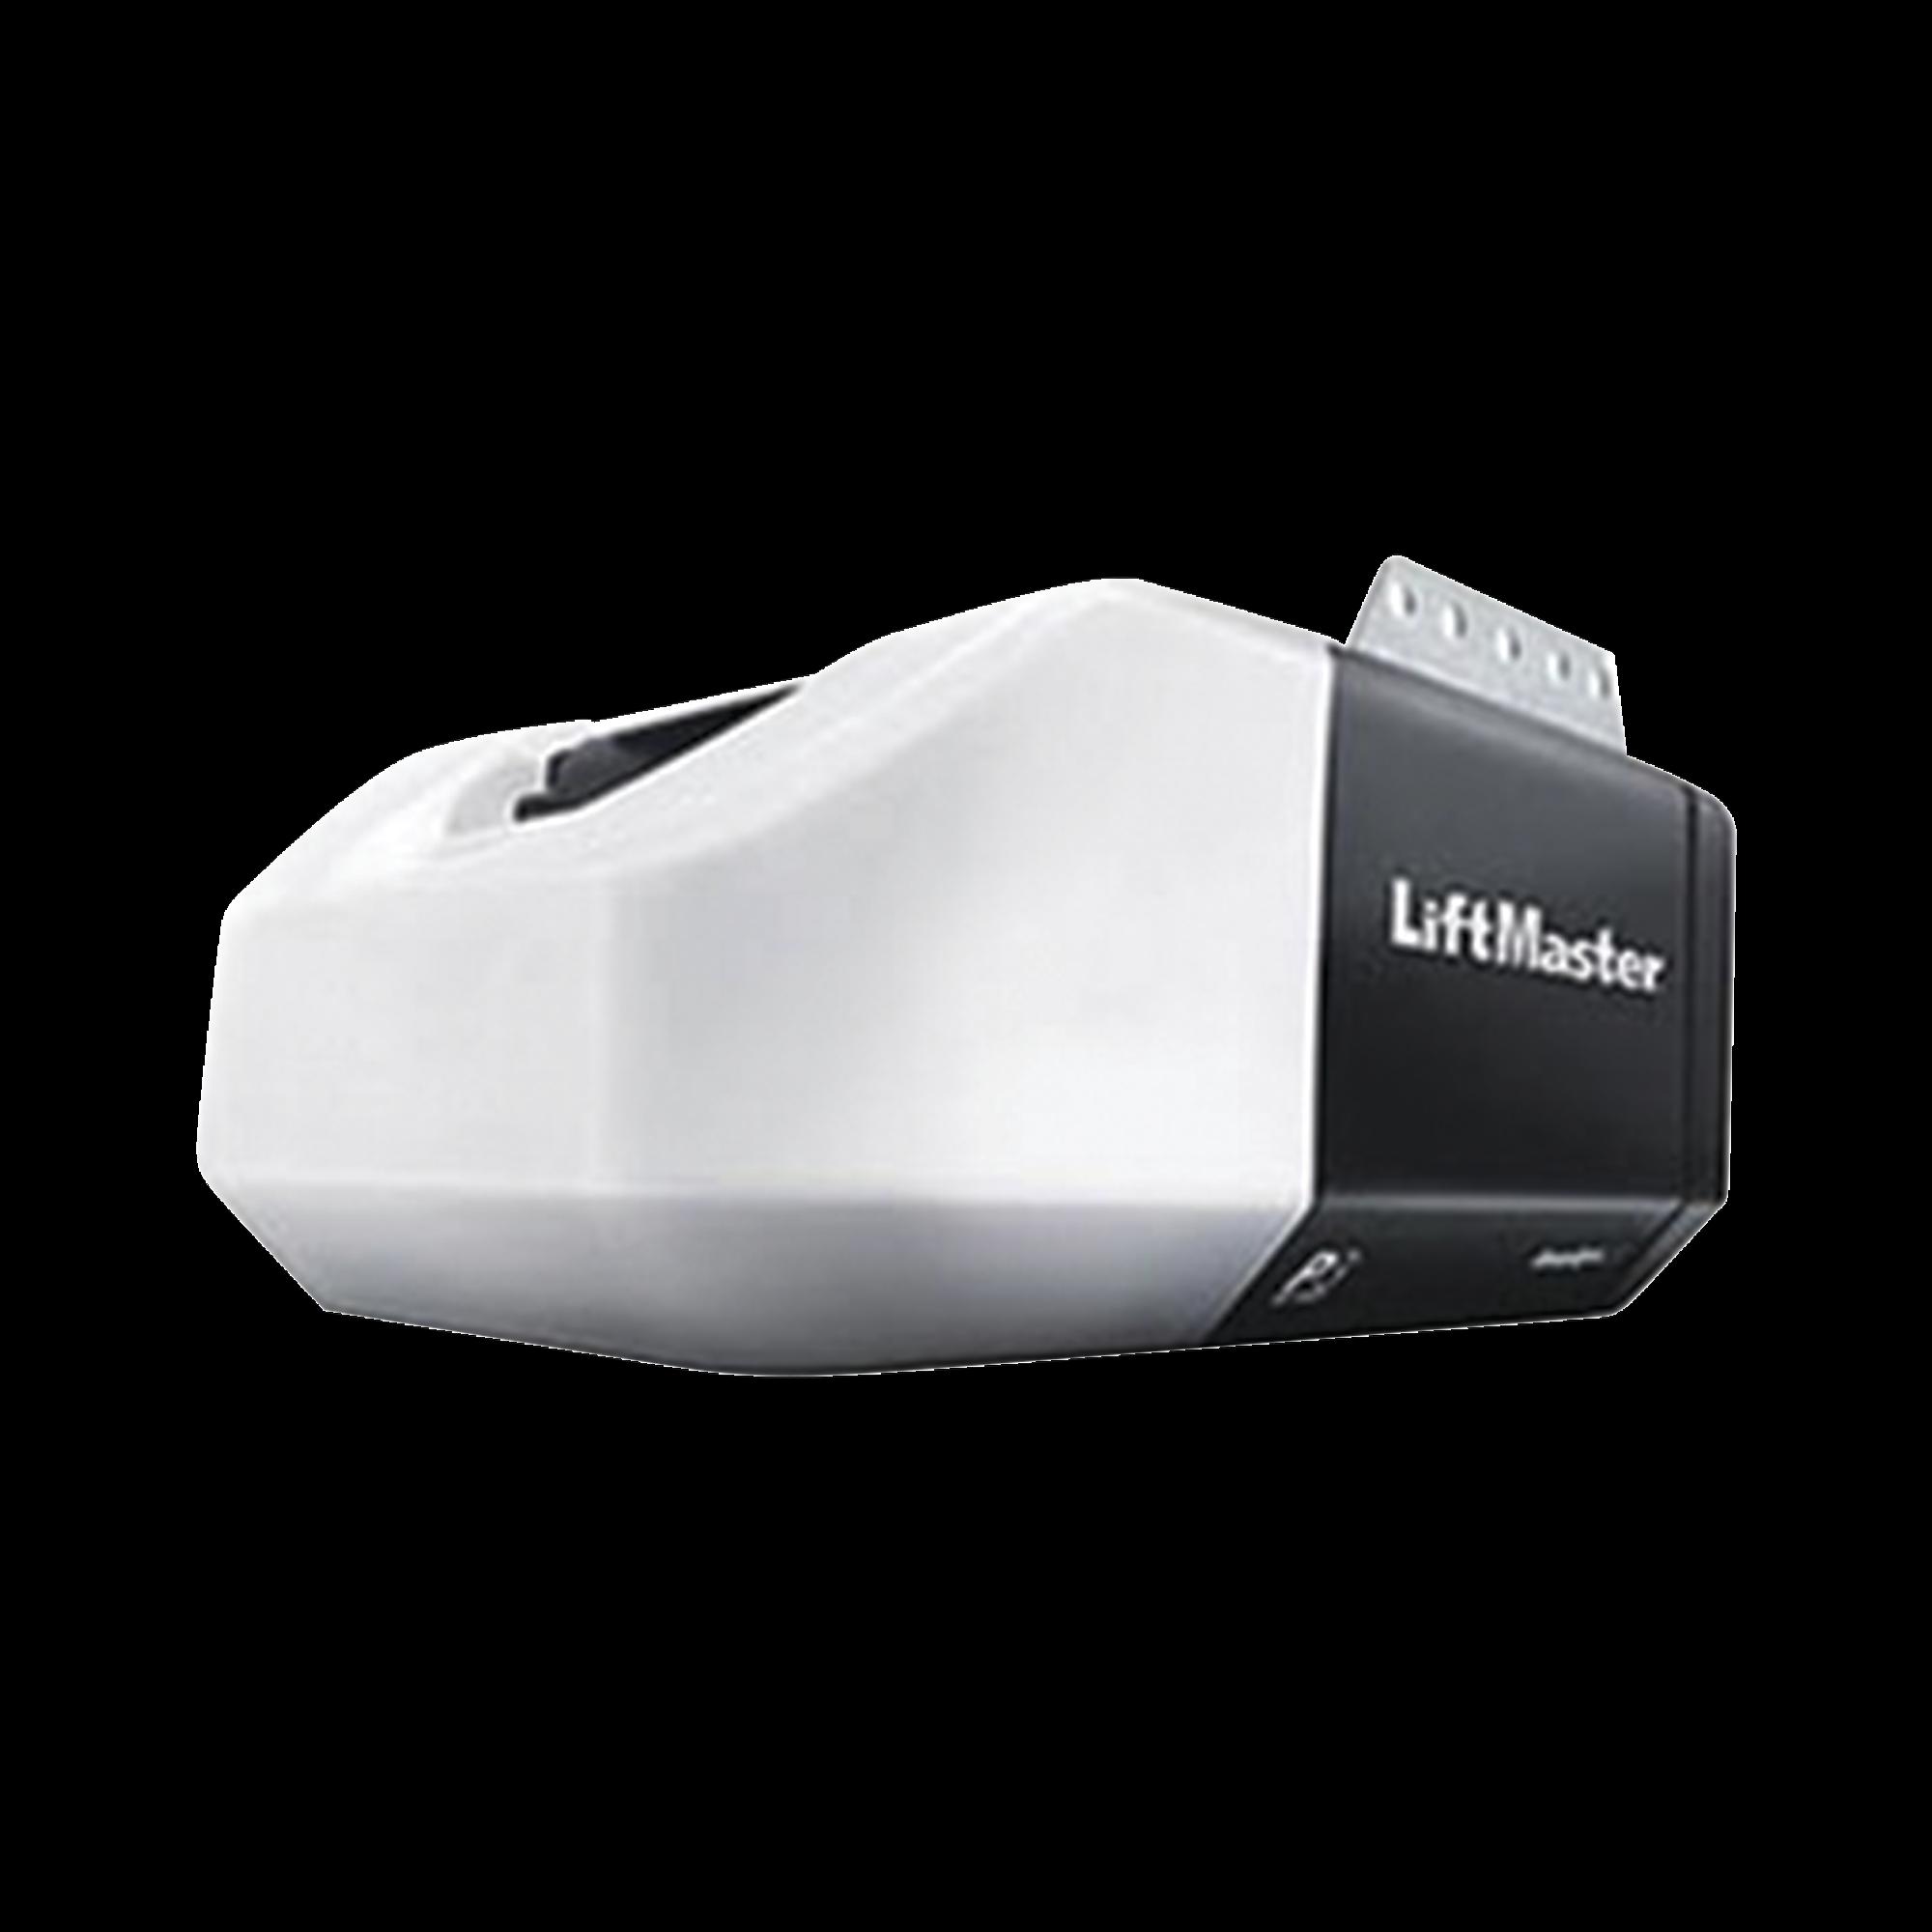 Abrepuertas de  Garaje Inteligente  8160LA / Permite Apertura via Celular con App MyQ / Linea Profesional Ultra-Silencioso